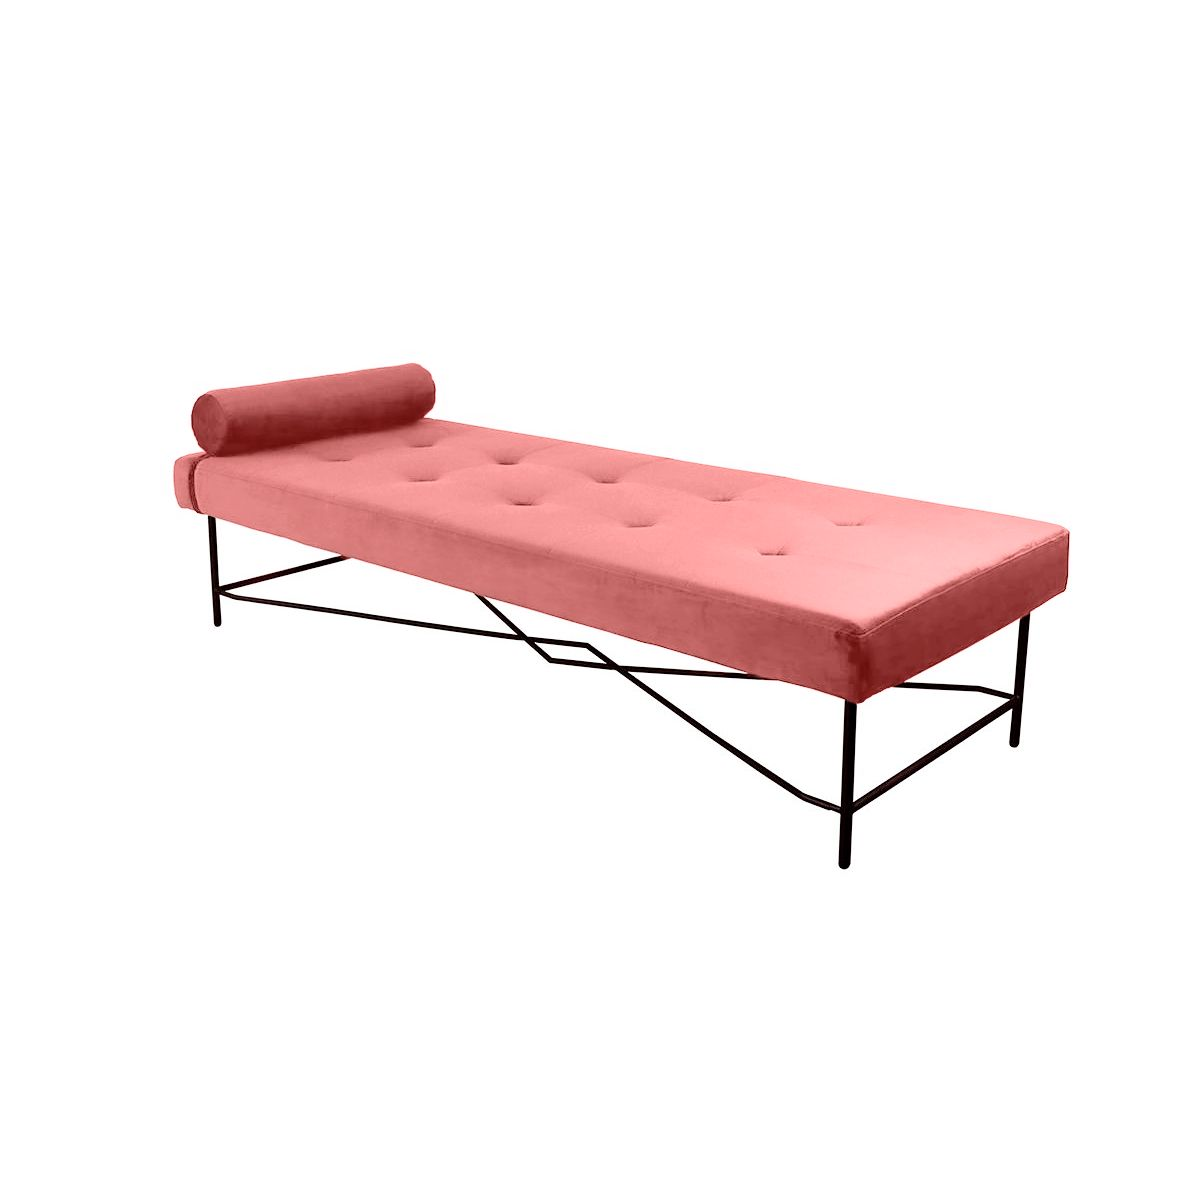 kick-chaise-lounge-bed-roze.jpg